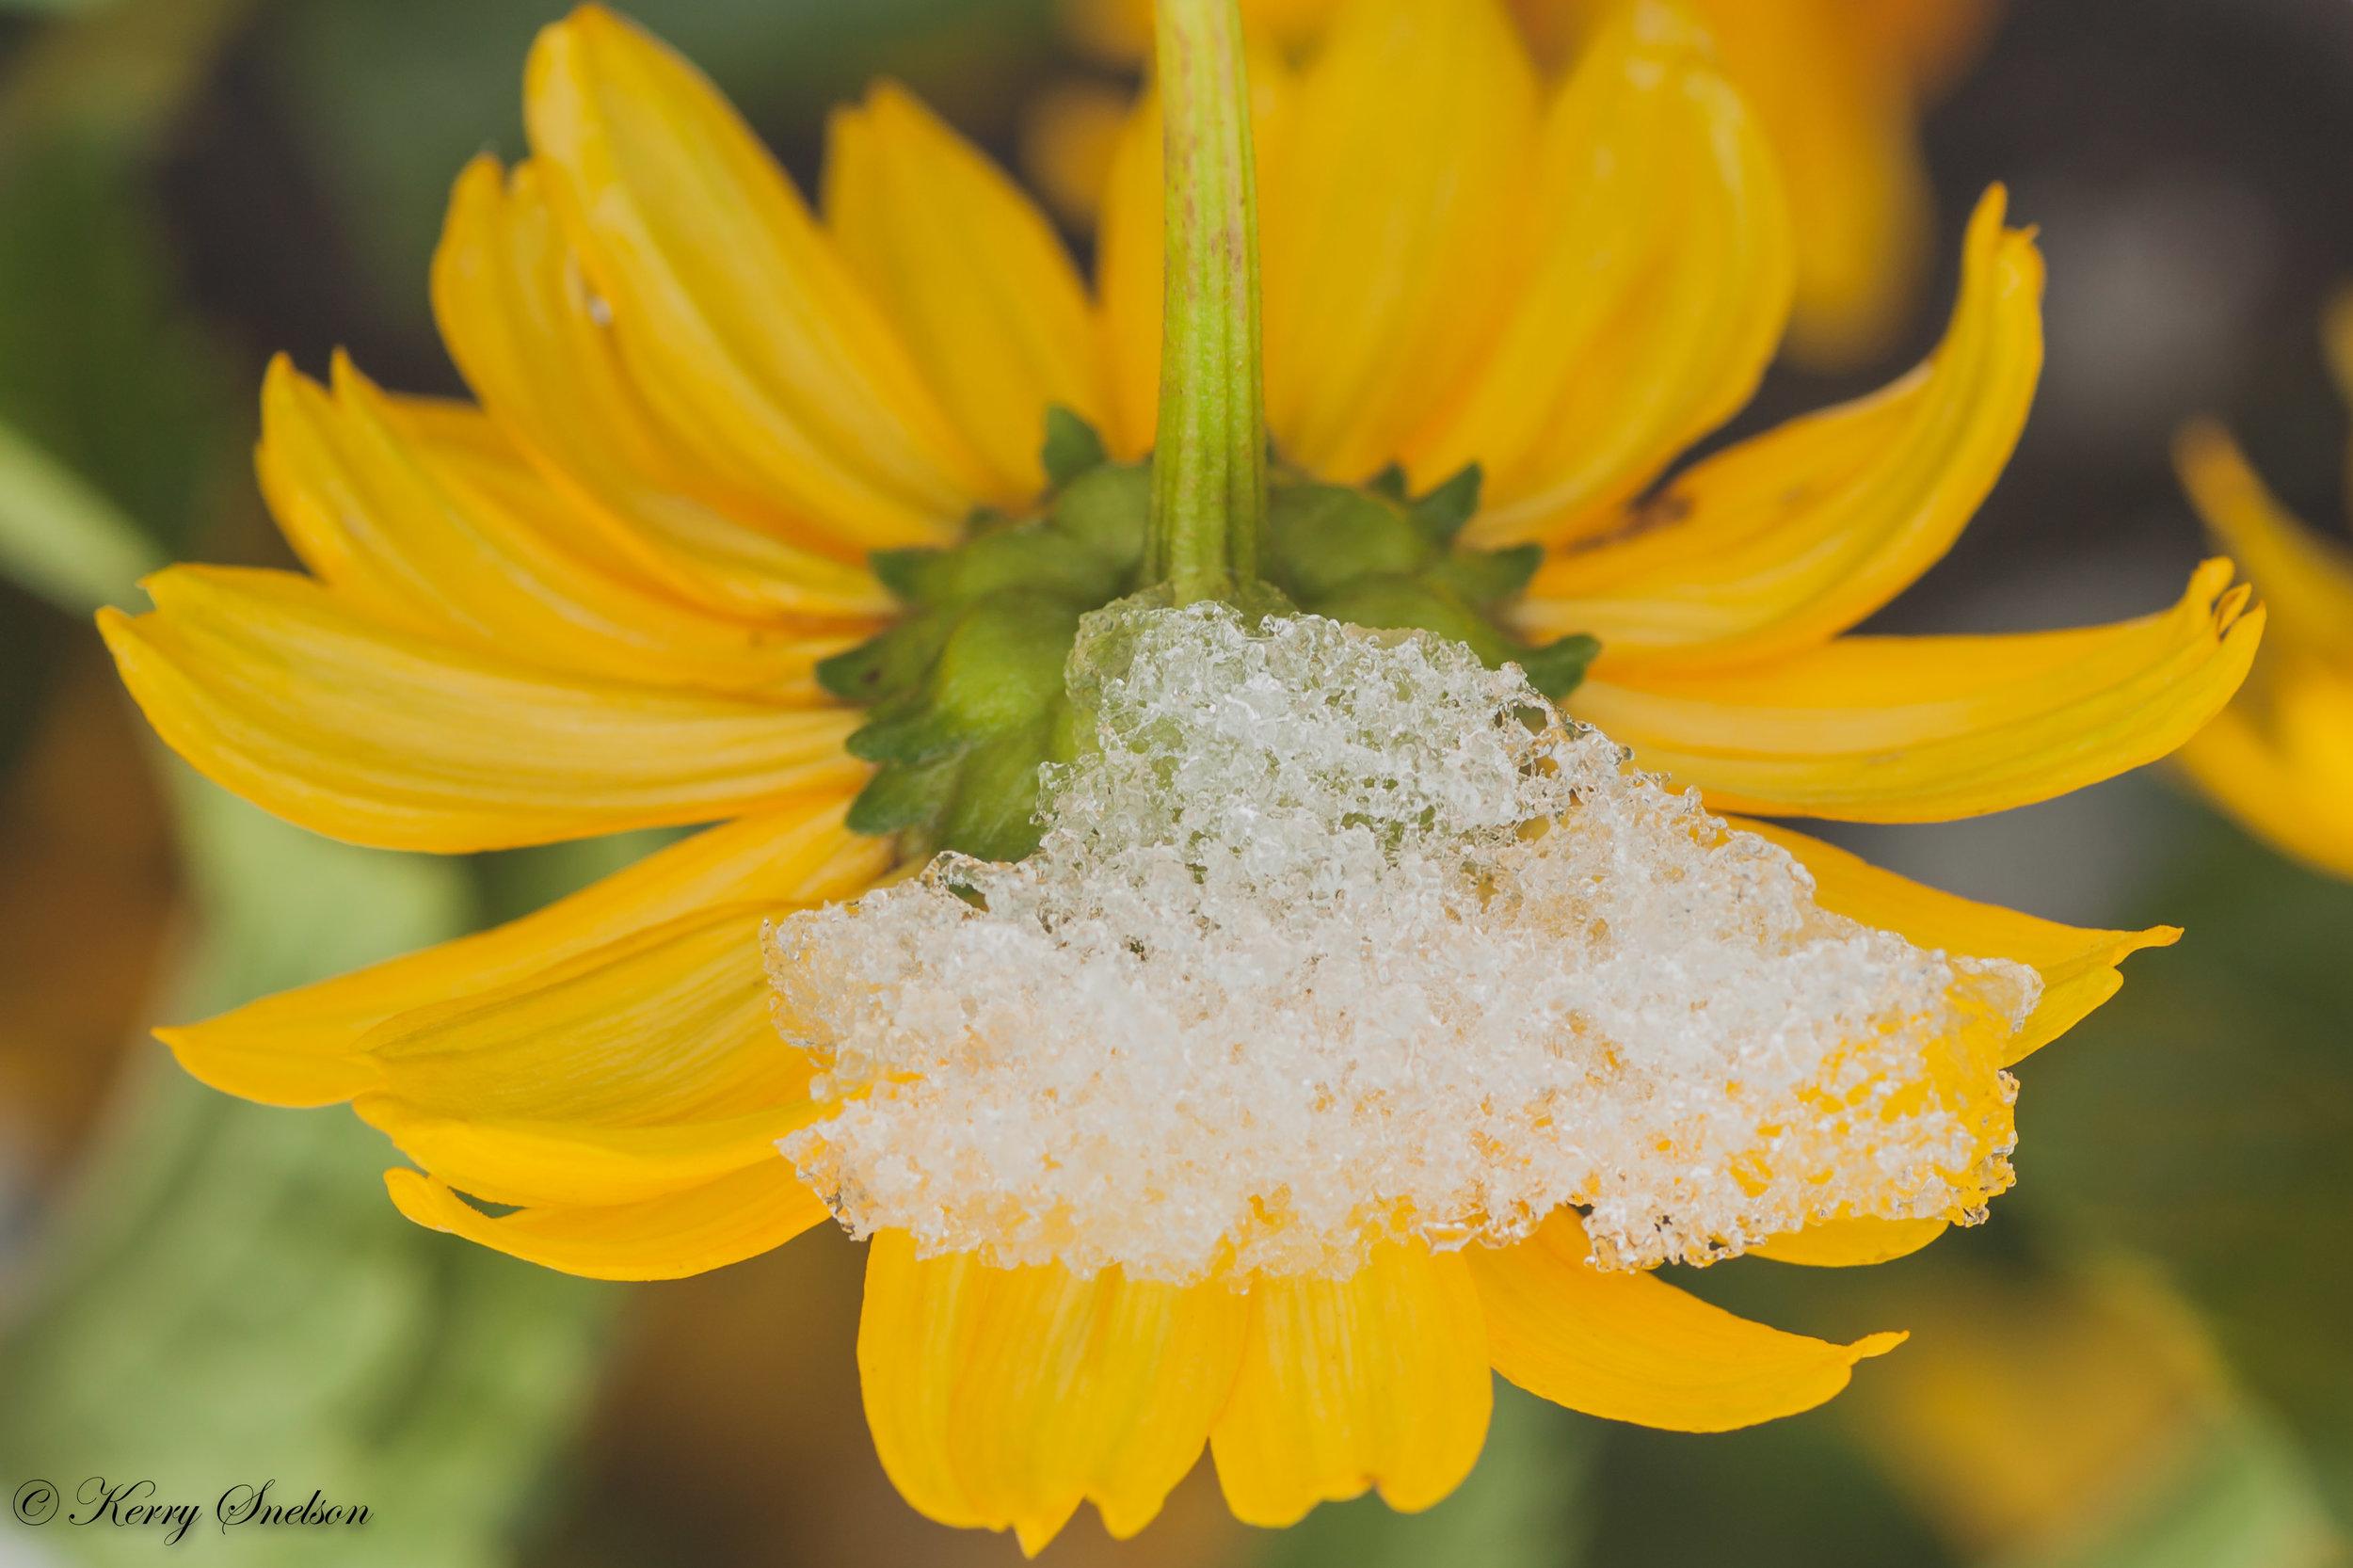 Snow on Chrysanthemum